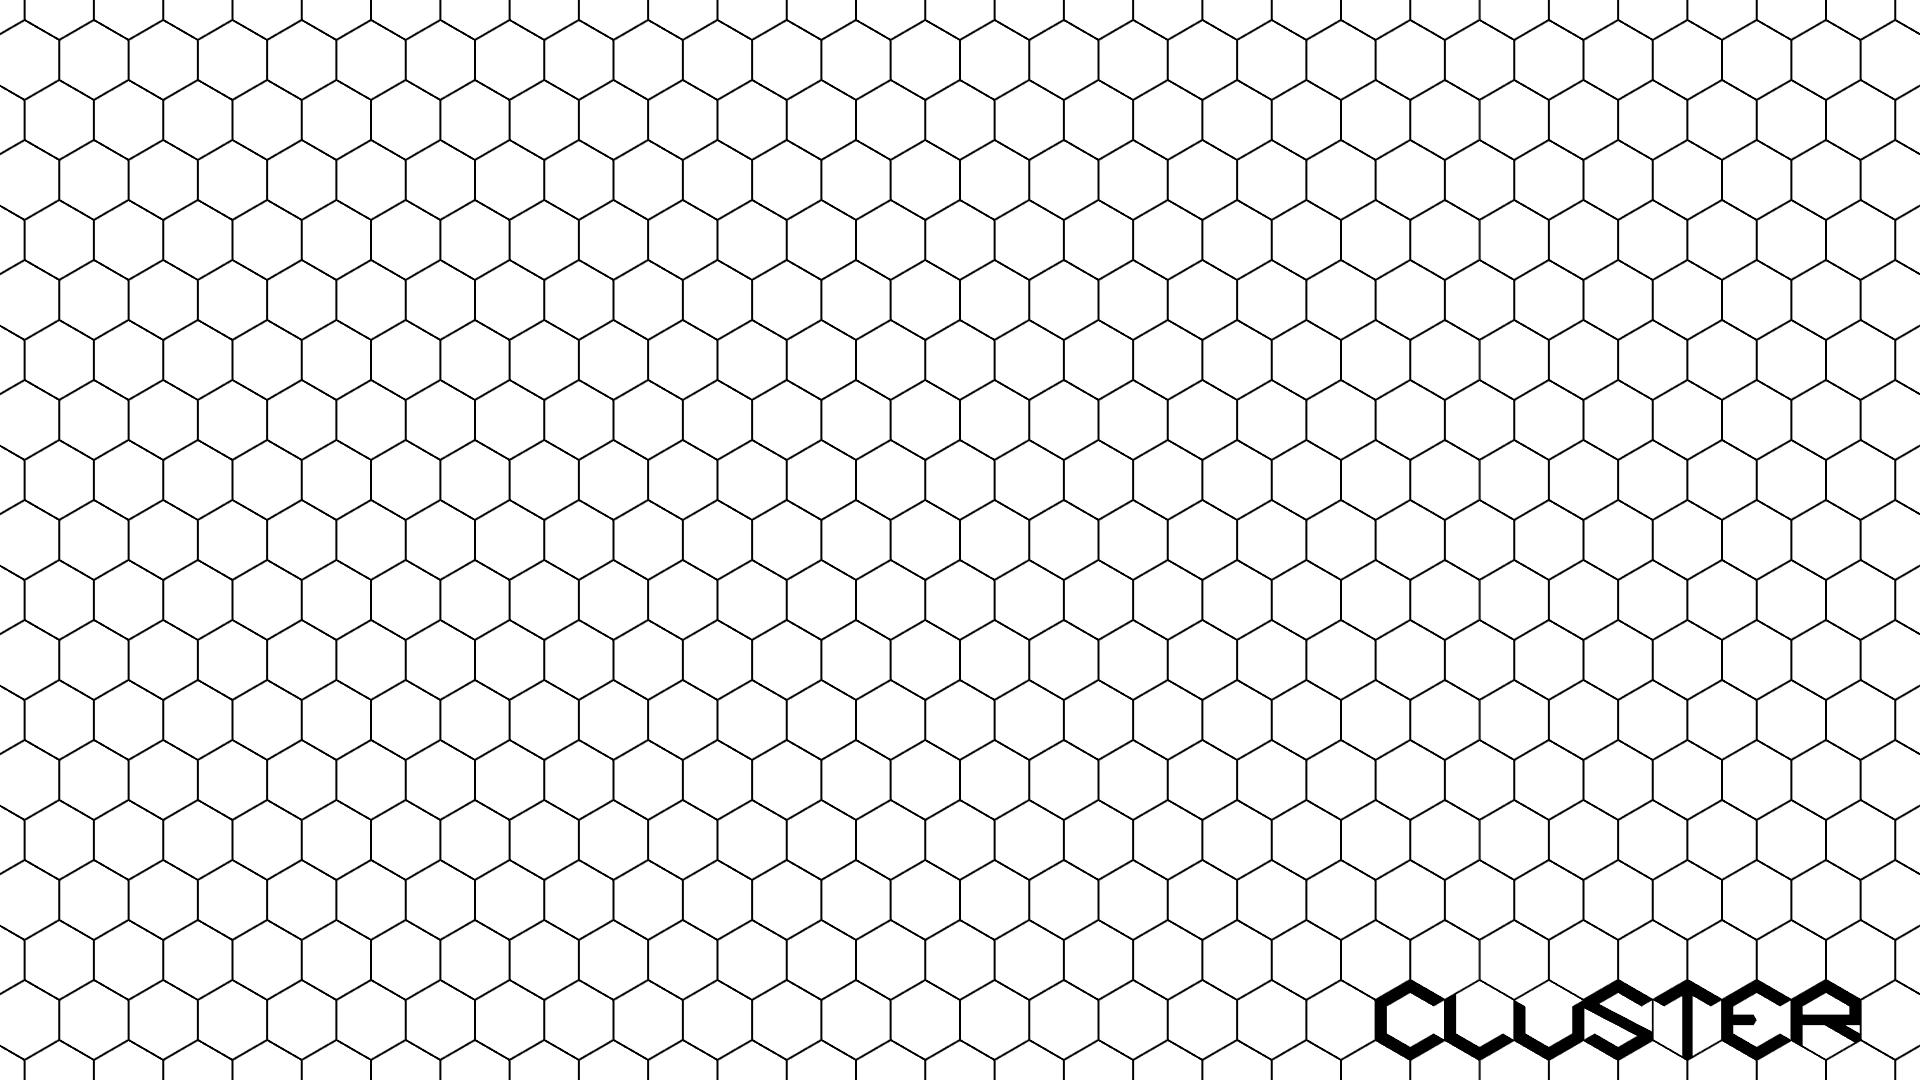 Add Media Report RSS Clean Hexagonal Grid View Original